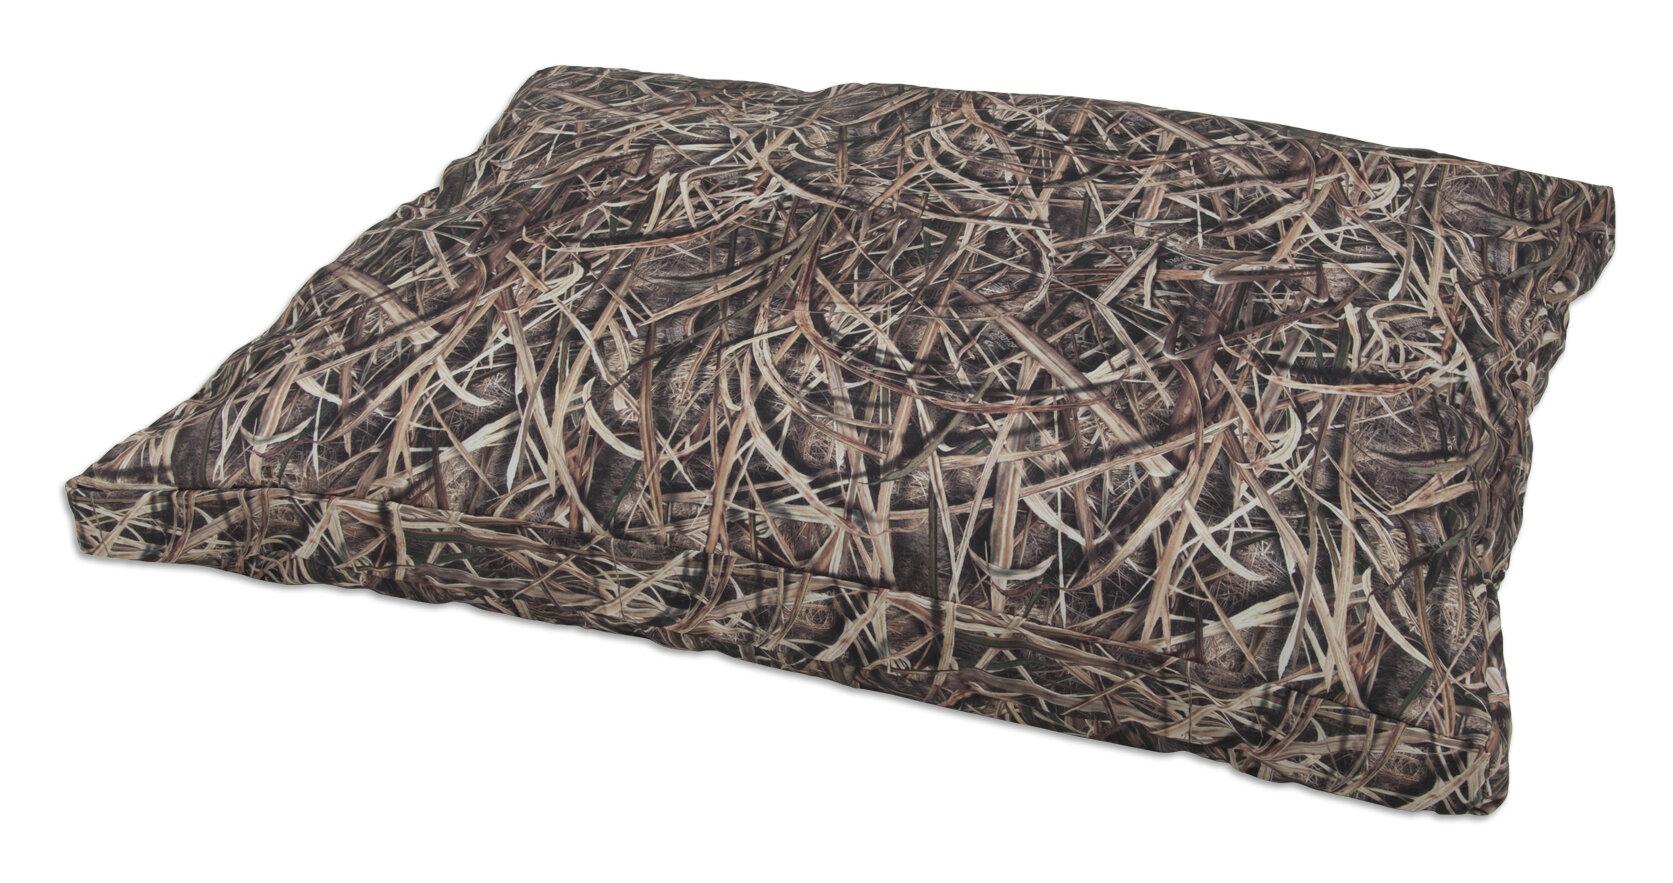 Mossy Oak Camo Foam Cushion